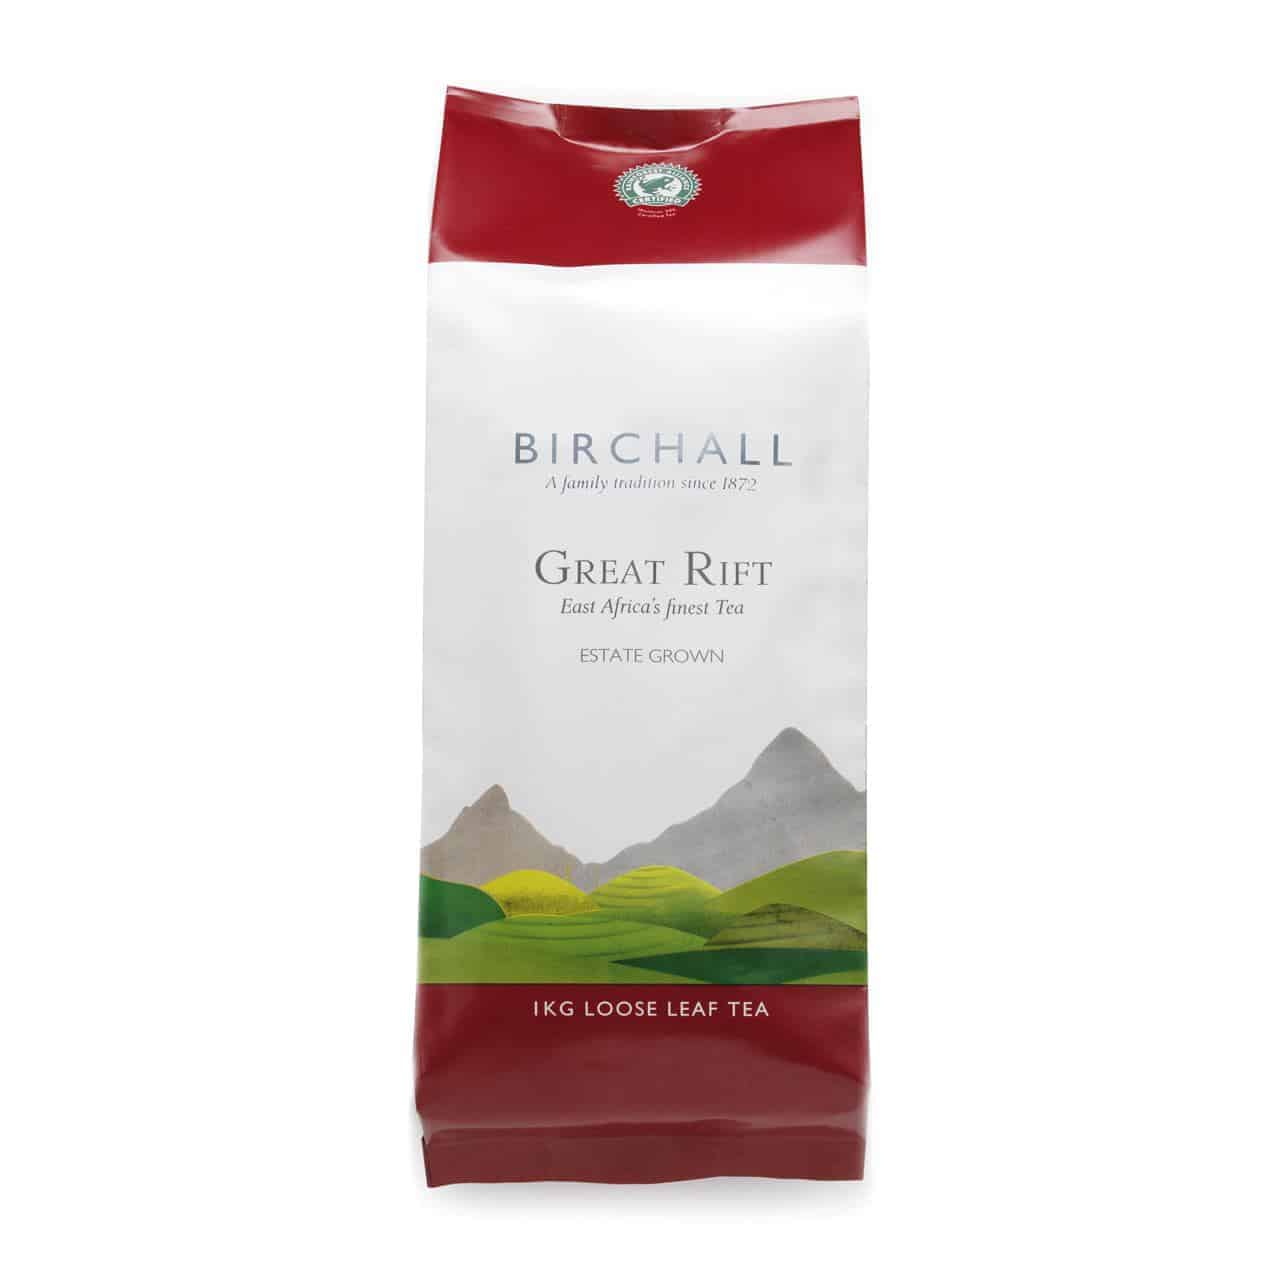 Birchall Great Rift Breakfast Blend - 1kg Loose Leaf Tea